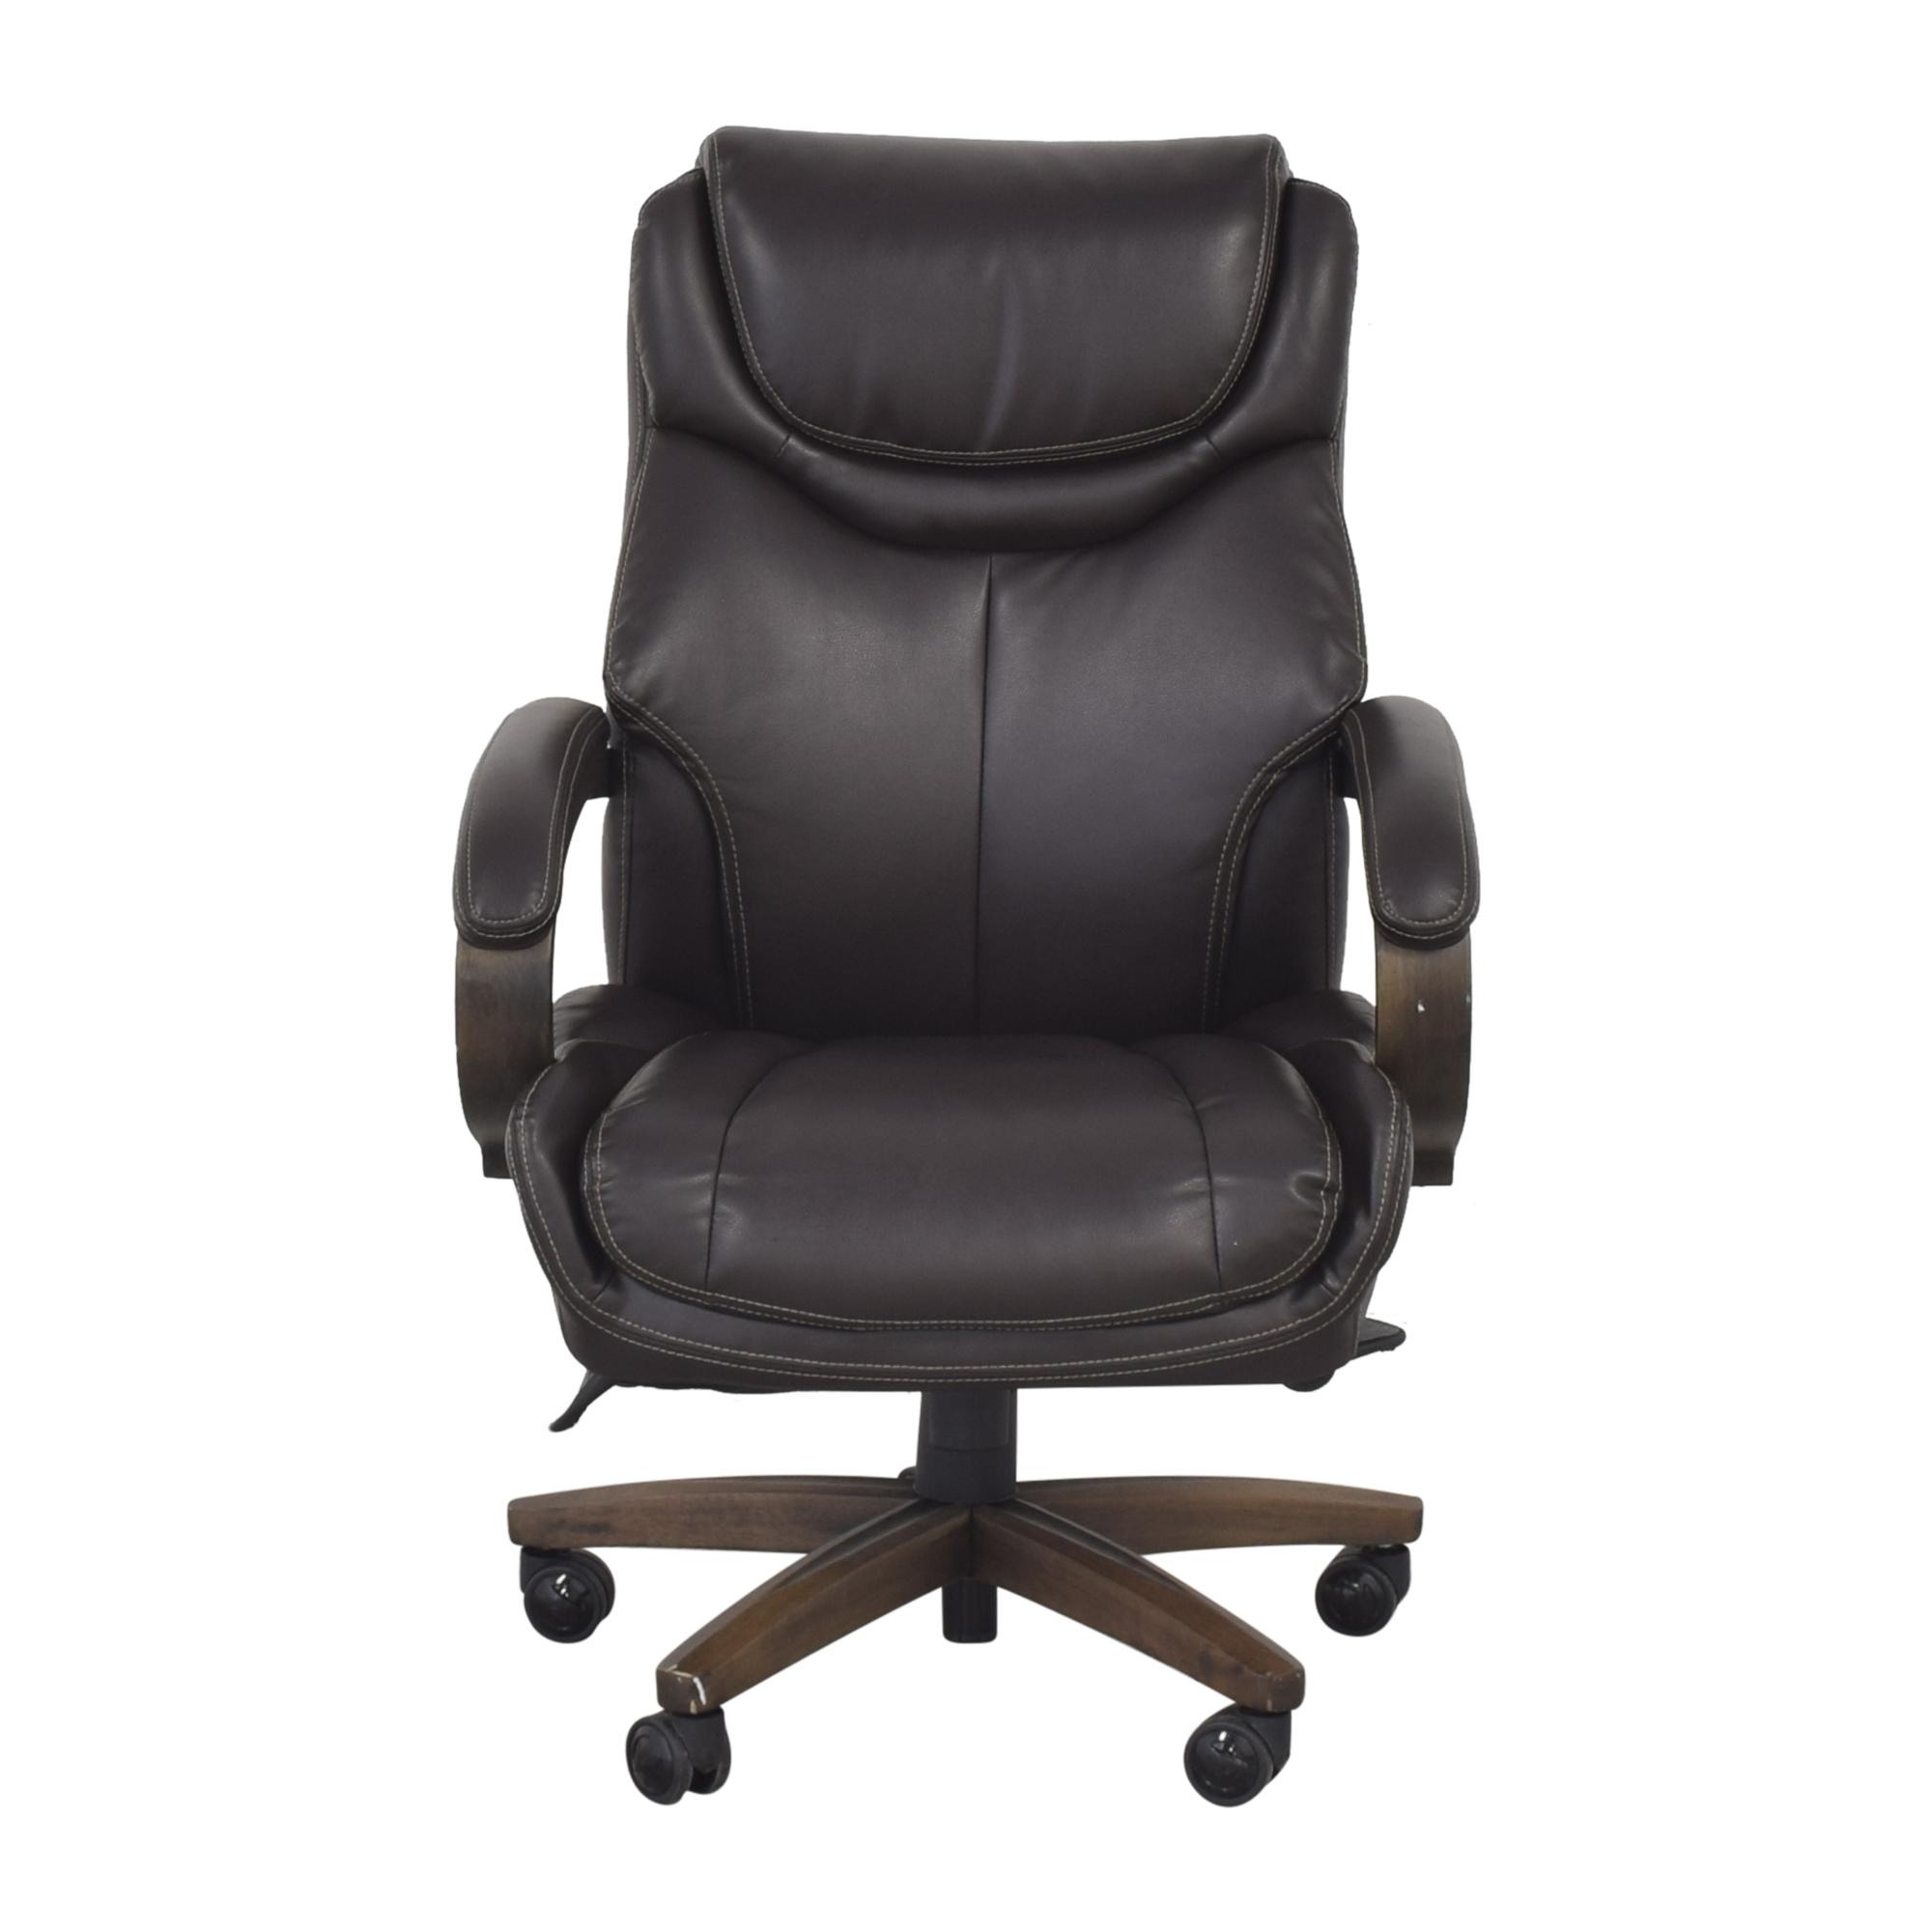 La-Z-Boy La-Z-Boy Executive-Style Office Chair for sale